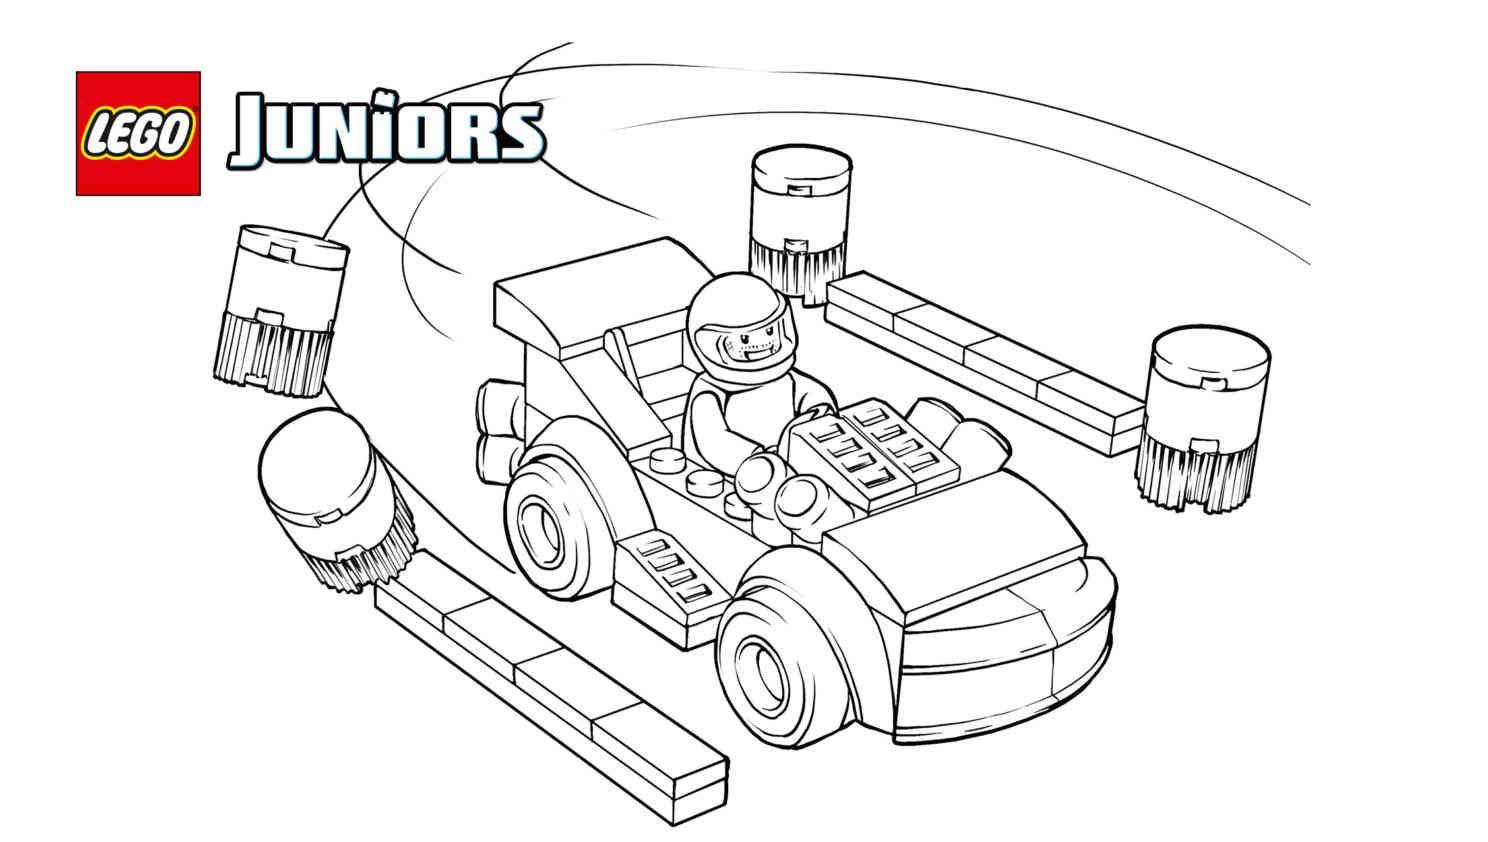 Lego Juniors Racing Car Driver Coloring Page Lego Juniors Lego Lego Videos